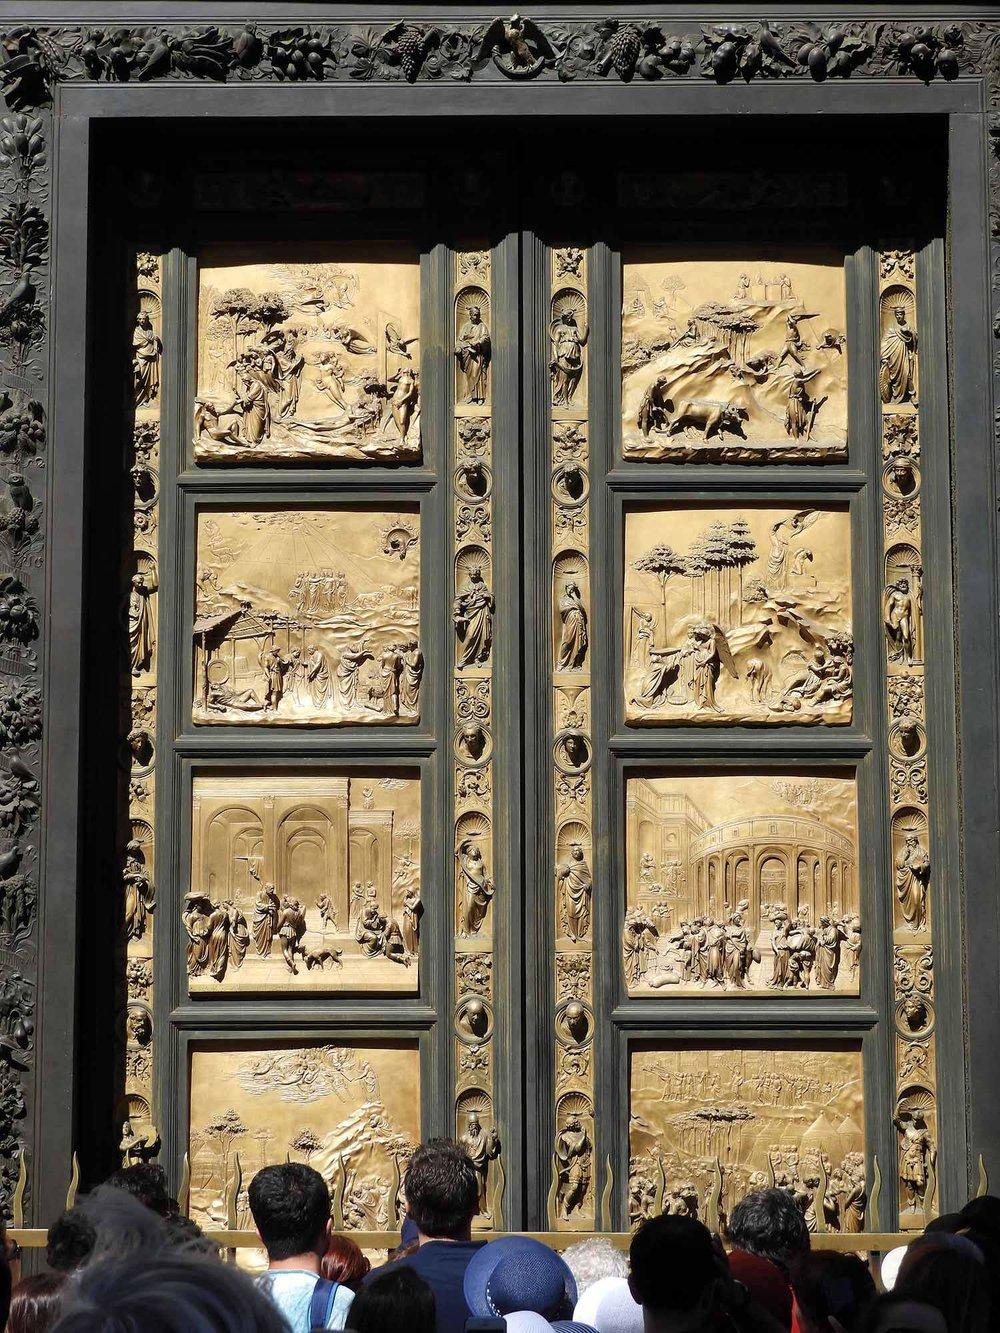 italy-italia-florence-cathedral-santa-maria-del-fiori-bronze-door.JPG